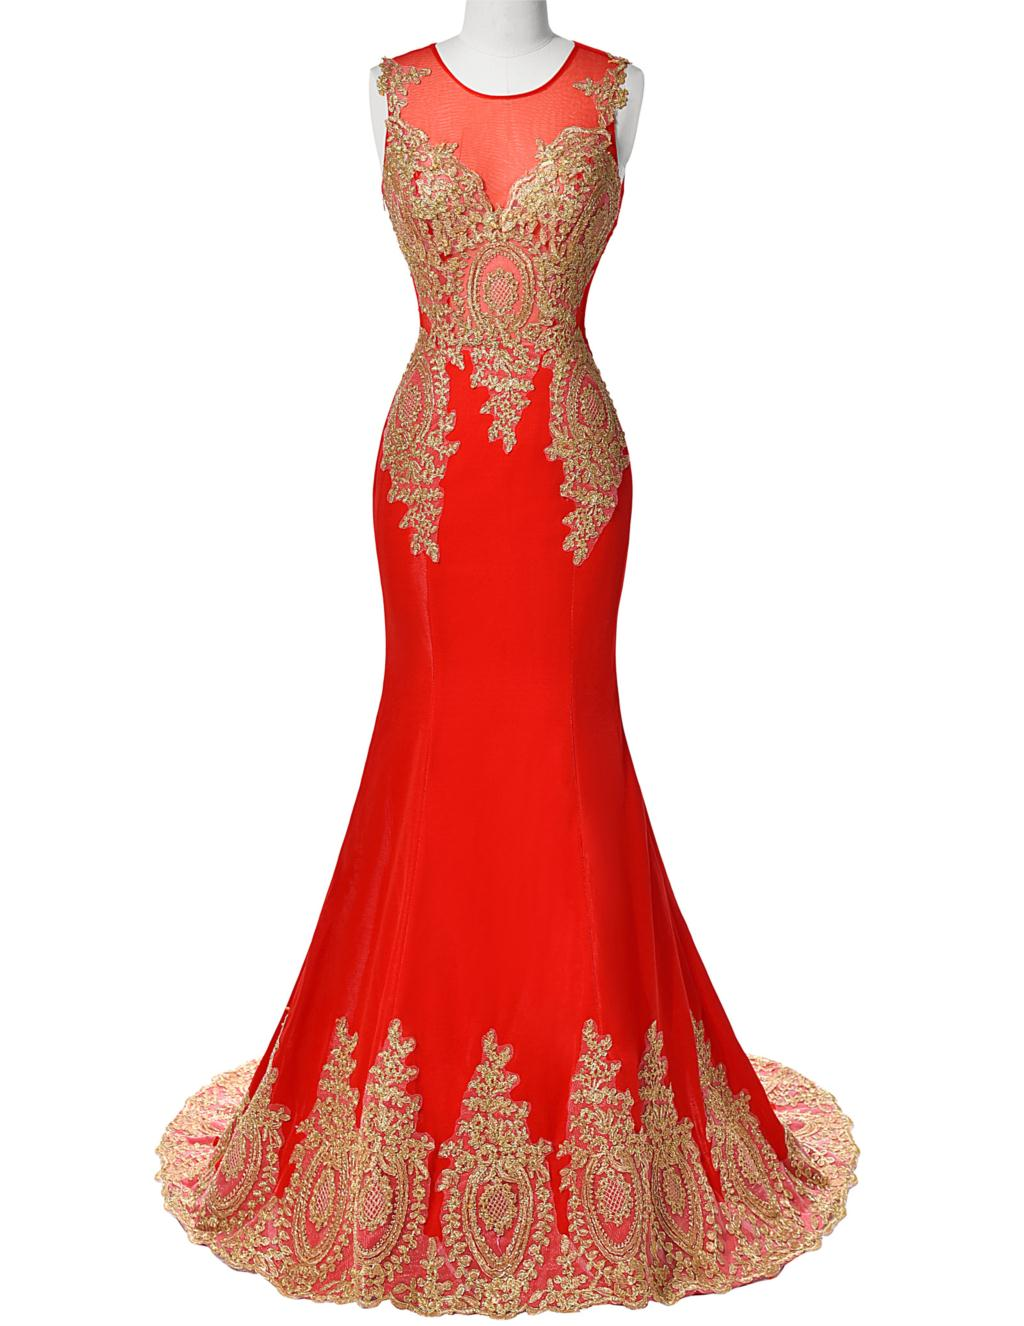 red wedding dresses red wedding dresses Dress